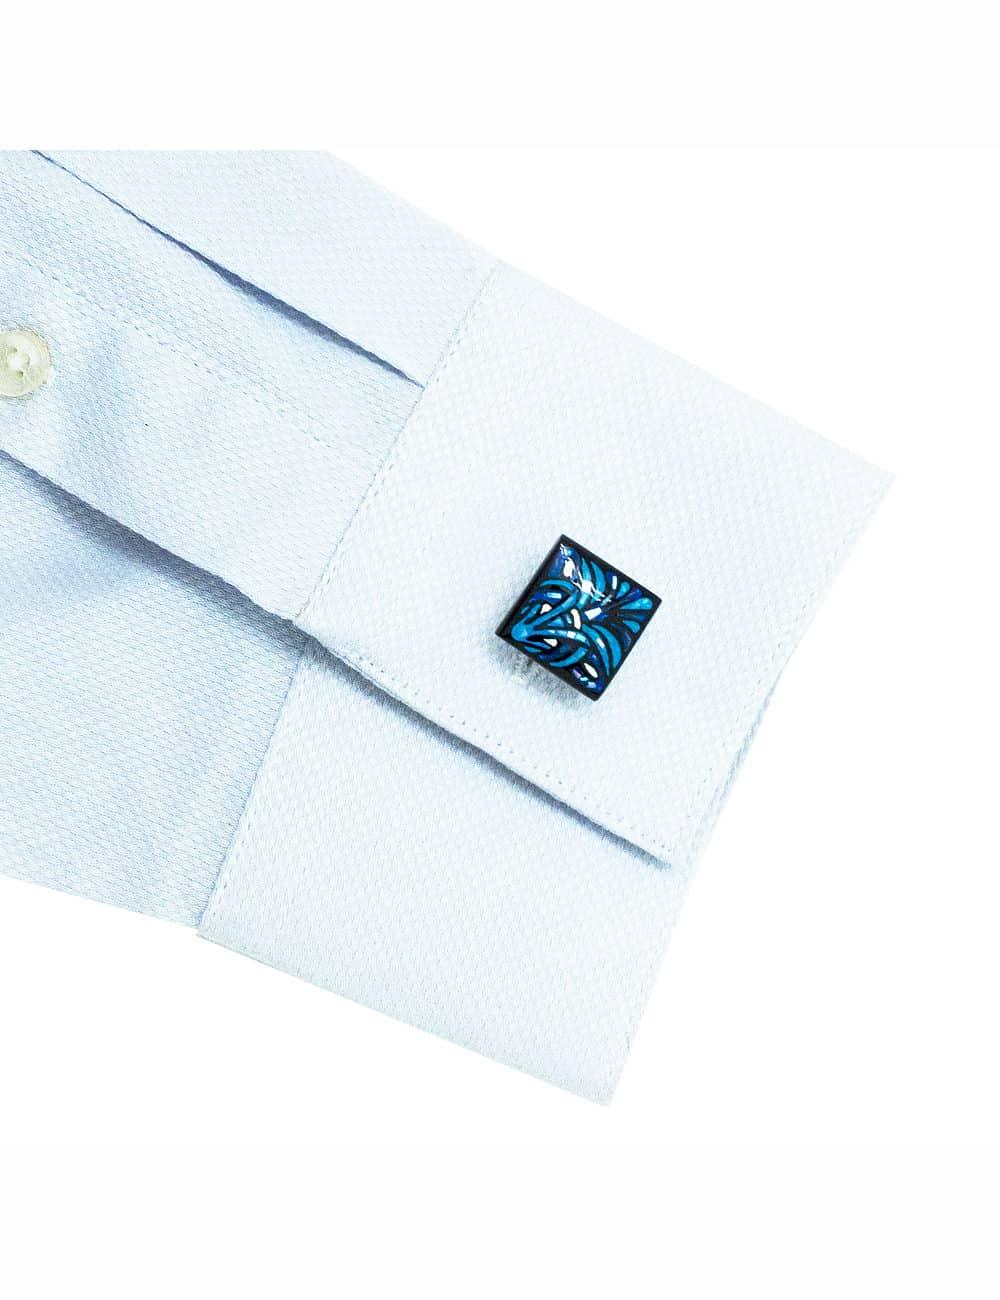 CF Grey Dobby Wingtip Collar 100% Premium Cotton Spill Resistant Long Sleeve Single Cuff Shirt CF14G6.5